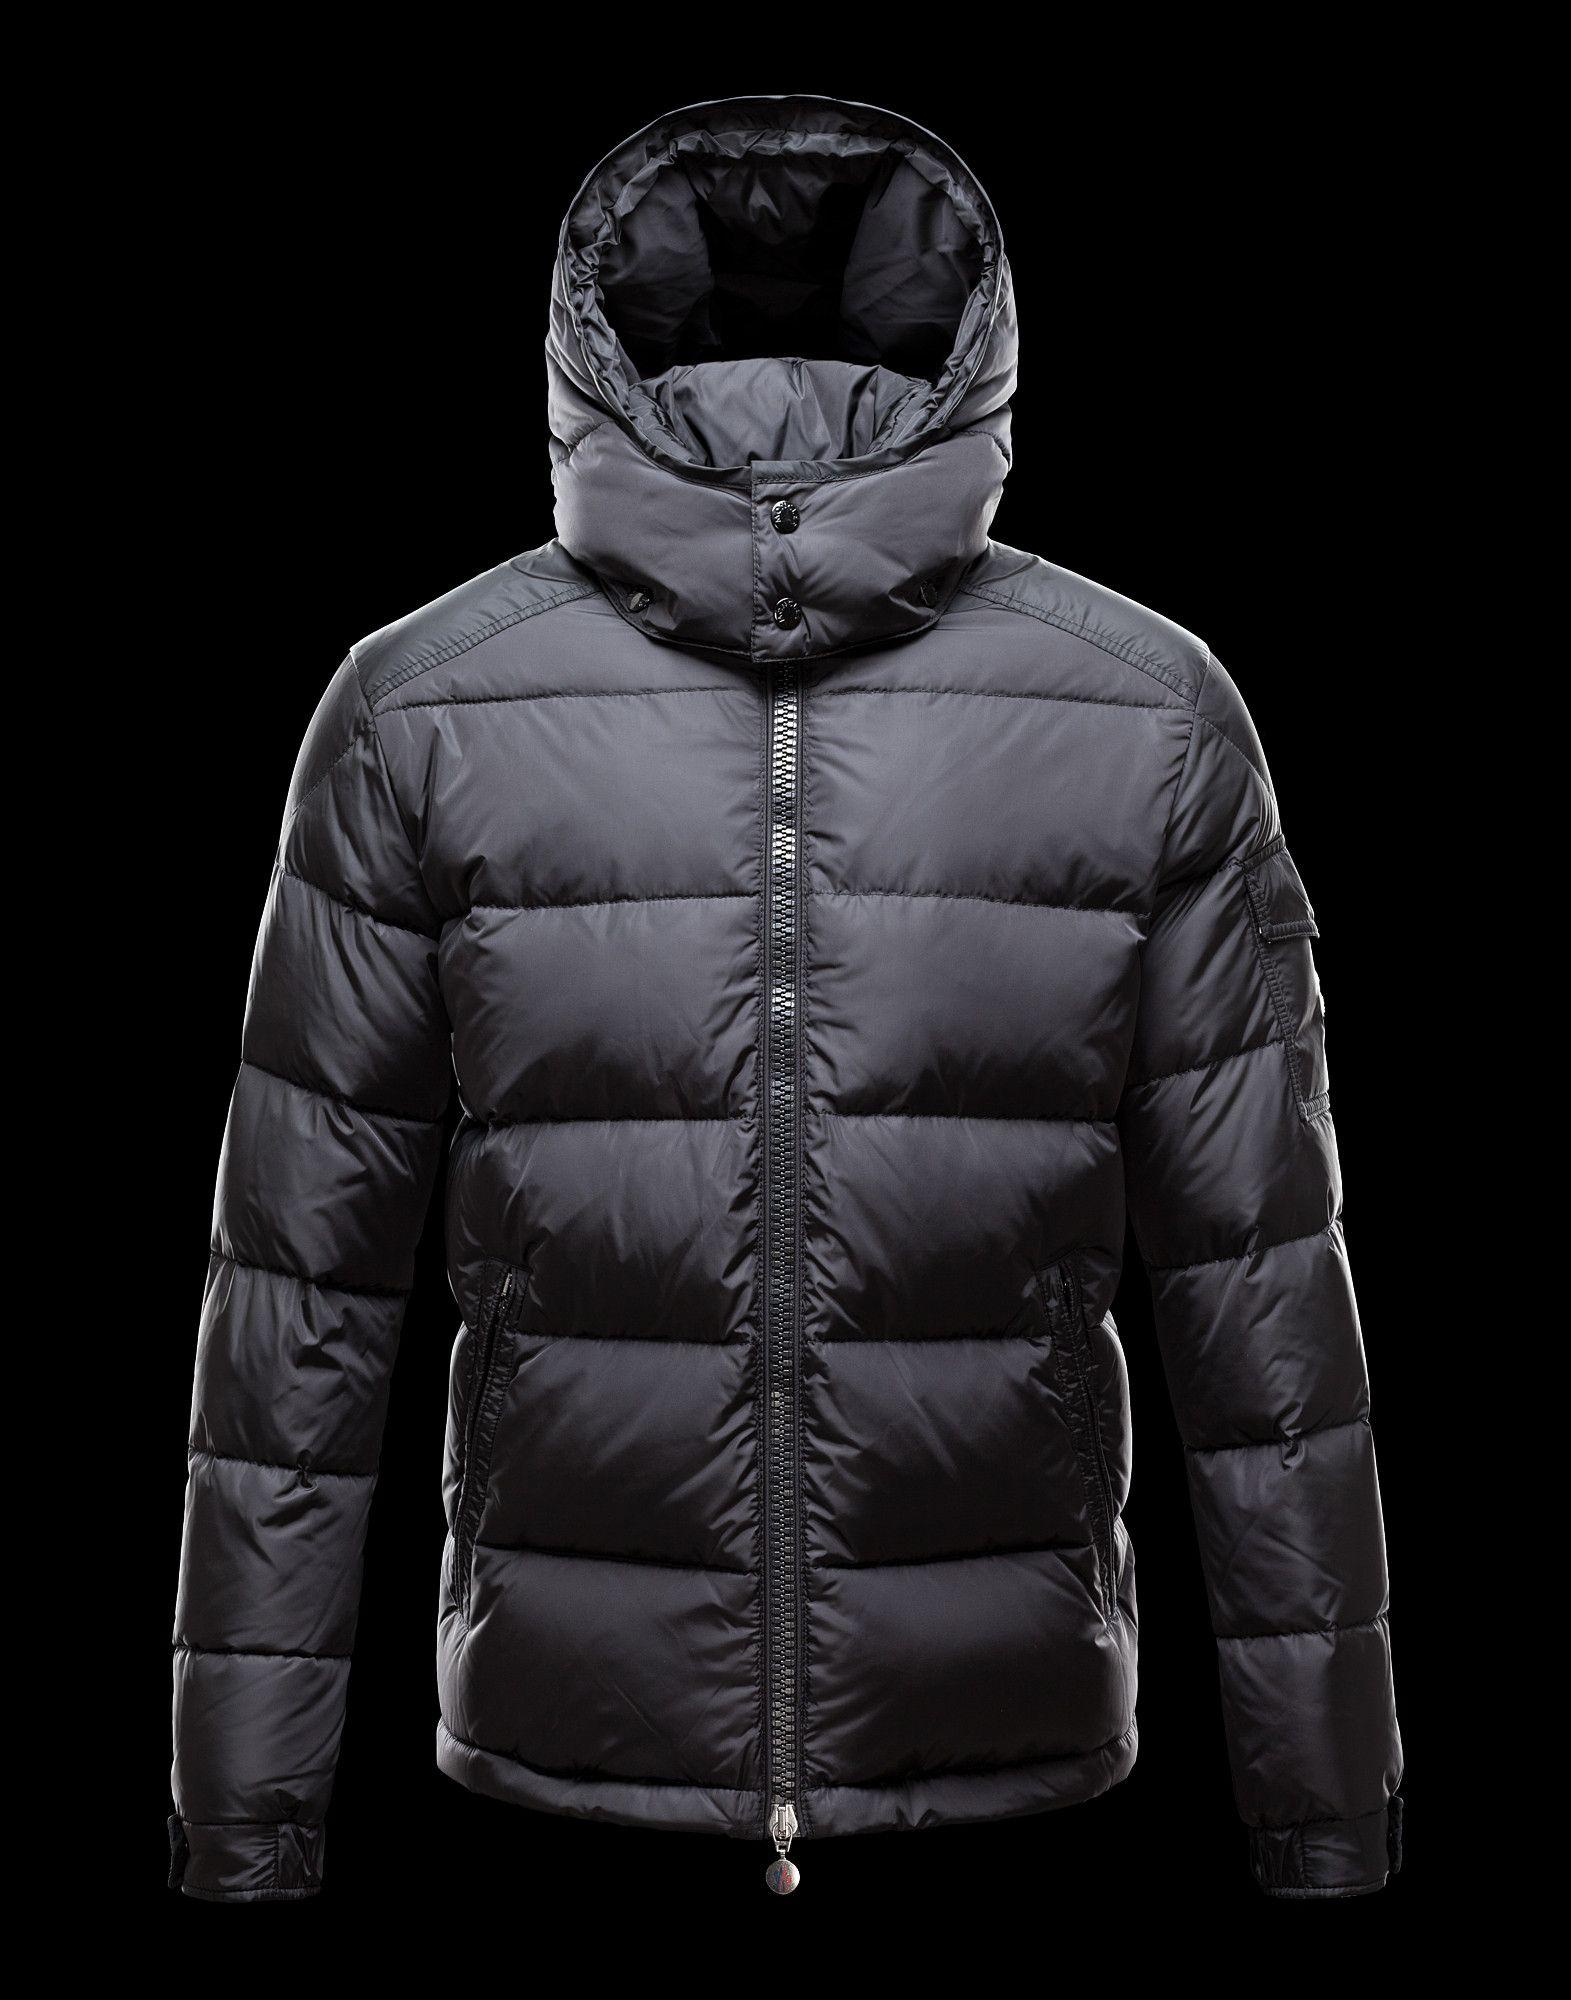 Moncler Maya Jacket (Black) PutHim2Getha Pinterest